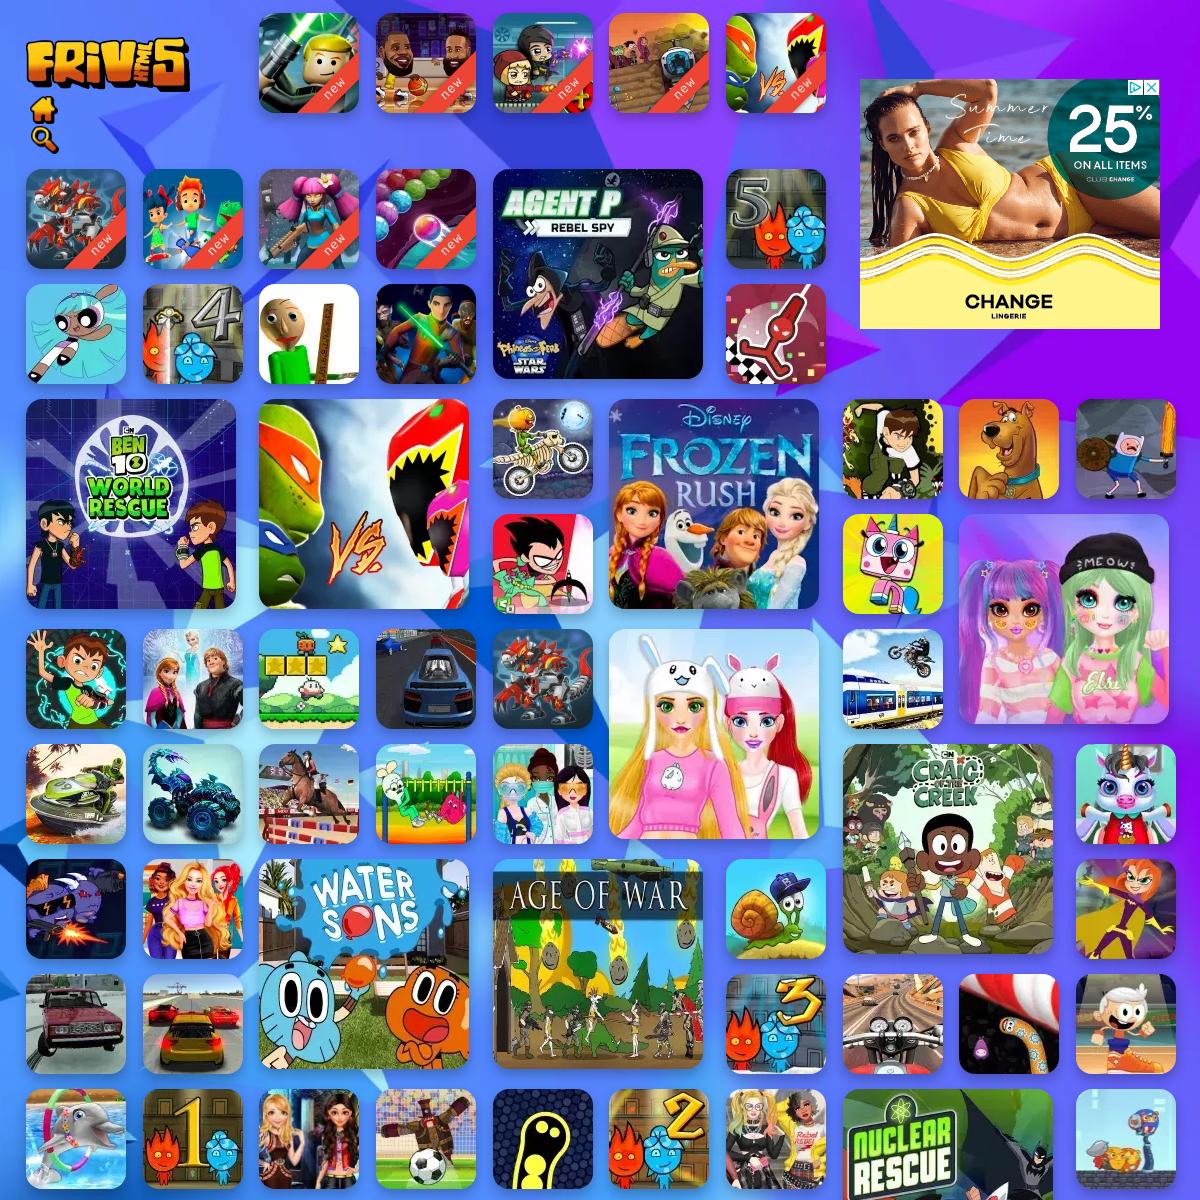 Friv 5 - Friv Games [Juegos Friv - Jogos Friv]